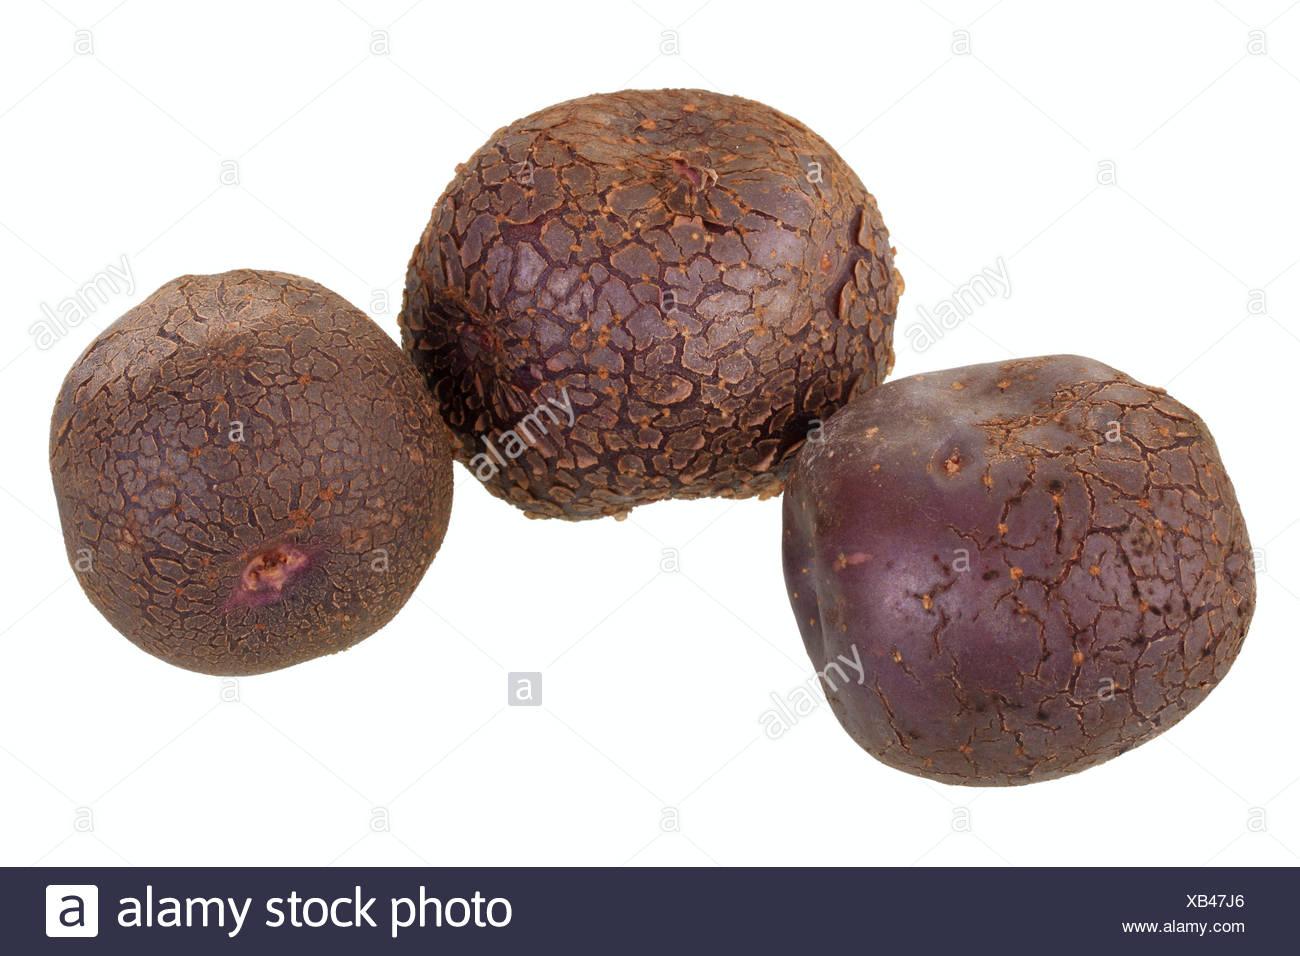 Potatoes, 'Odenwälder Blaue' variety - Stock Image